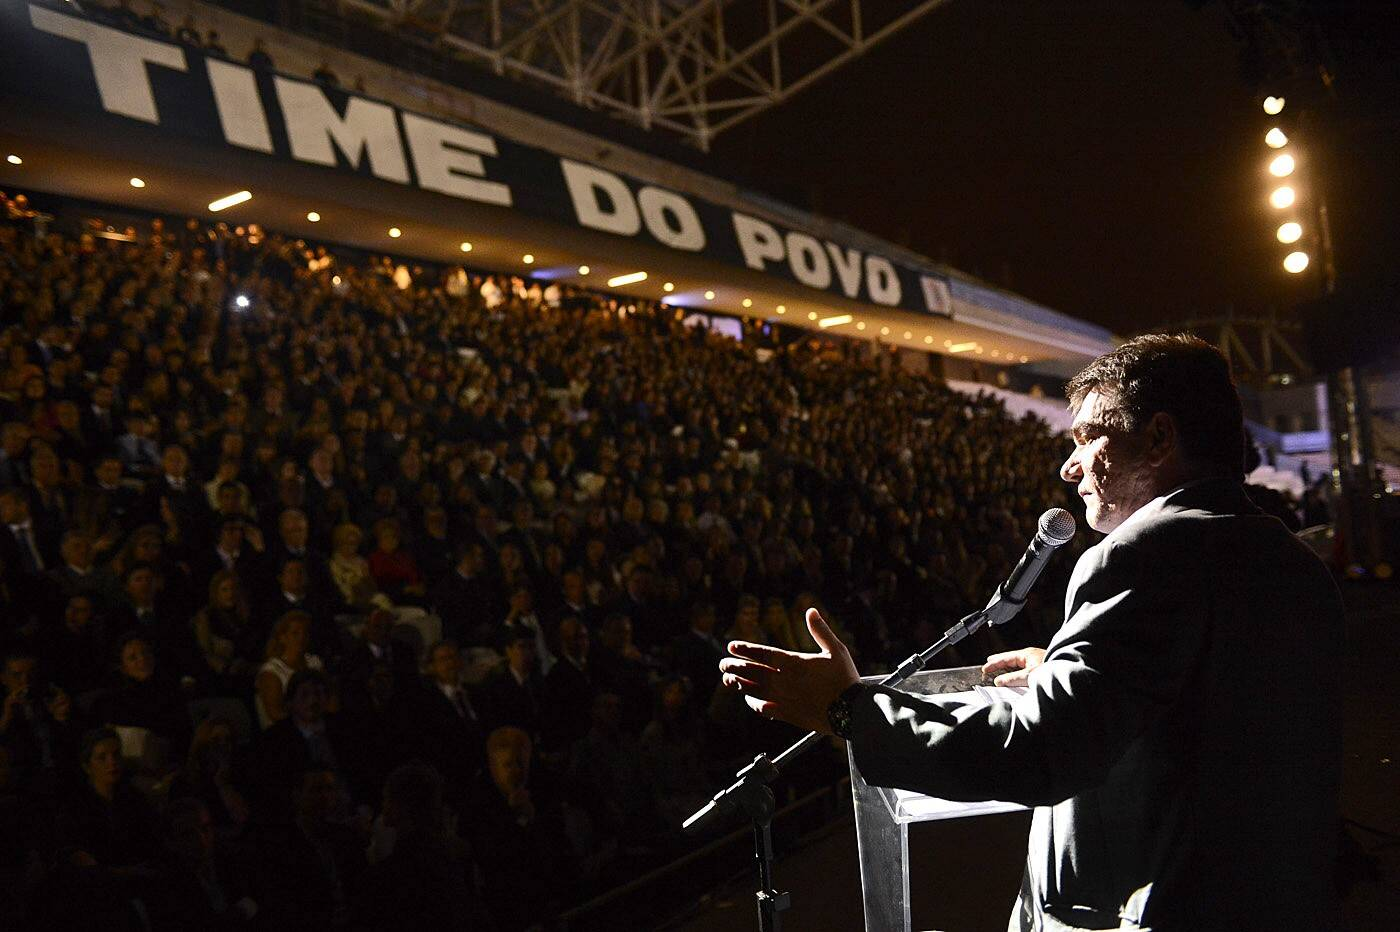 Foto: Mauro Horita/Agência Corinthians